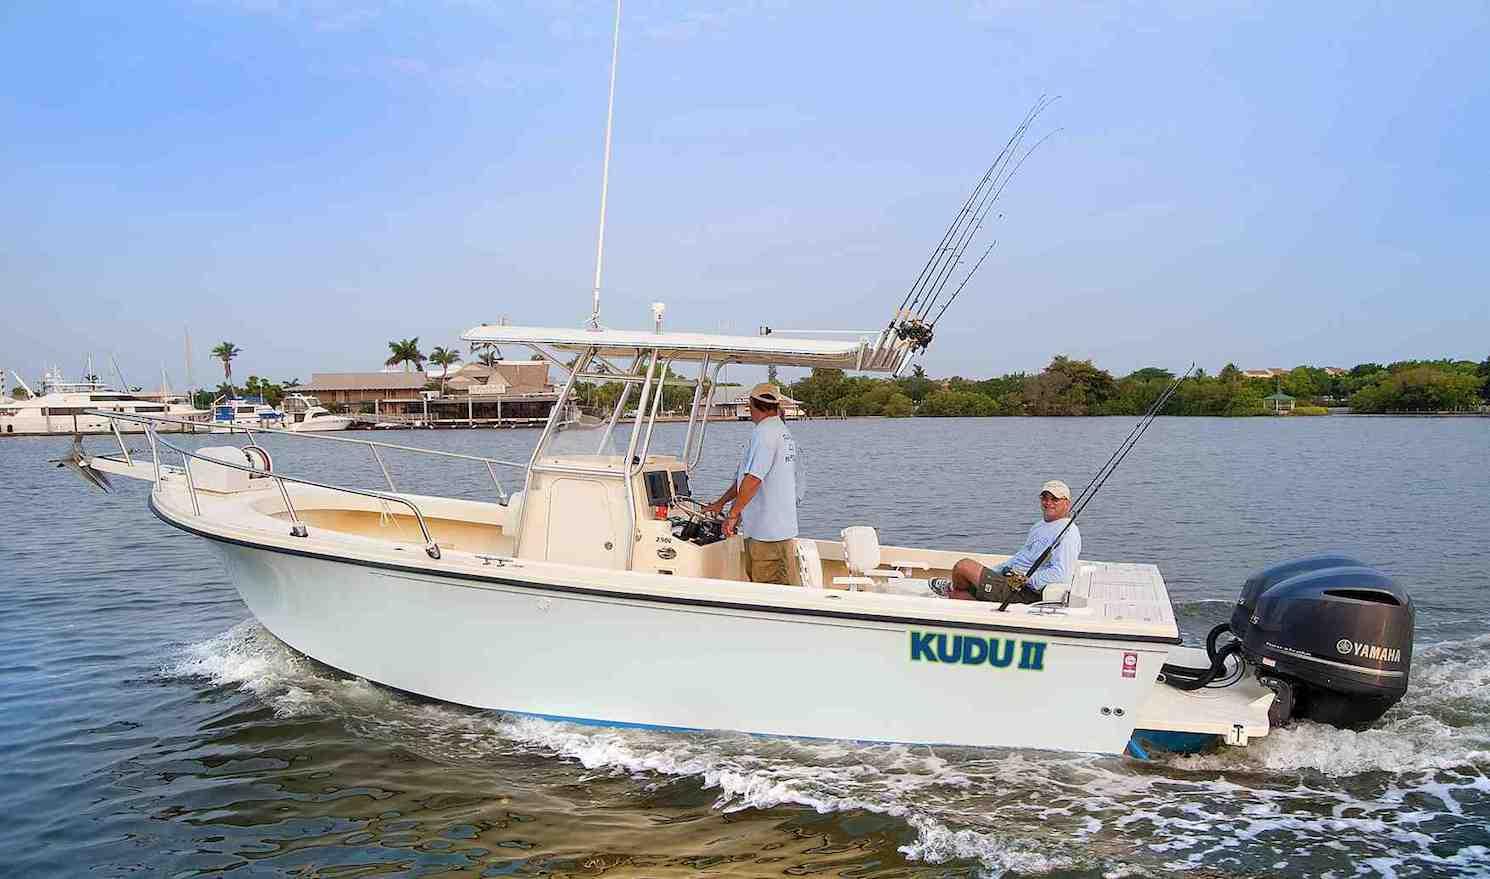 The M/V KUDU II